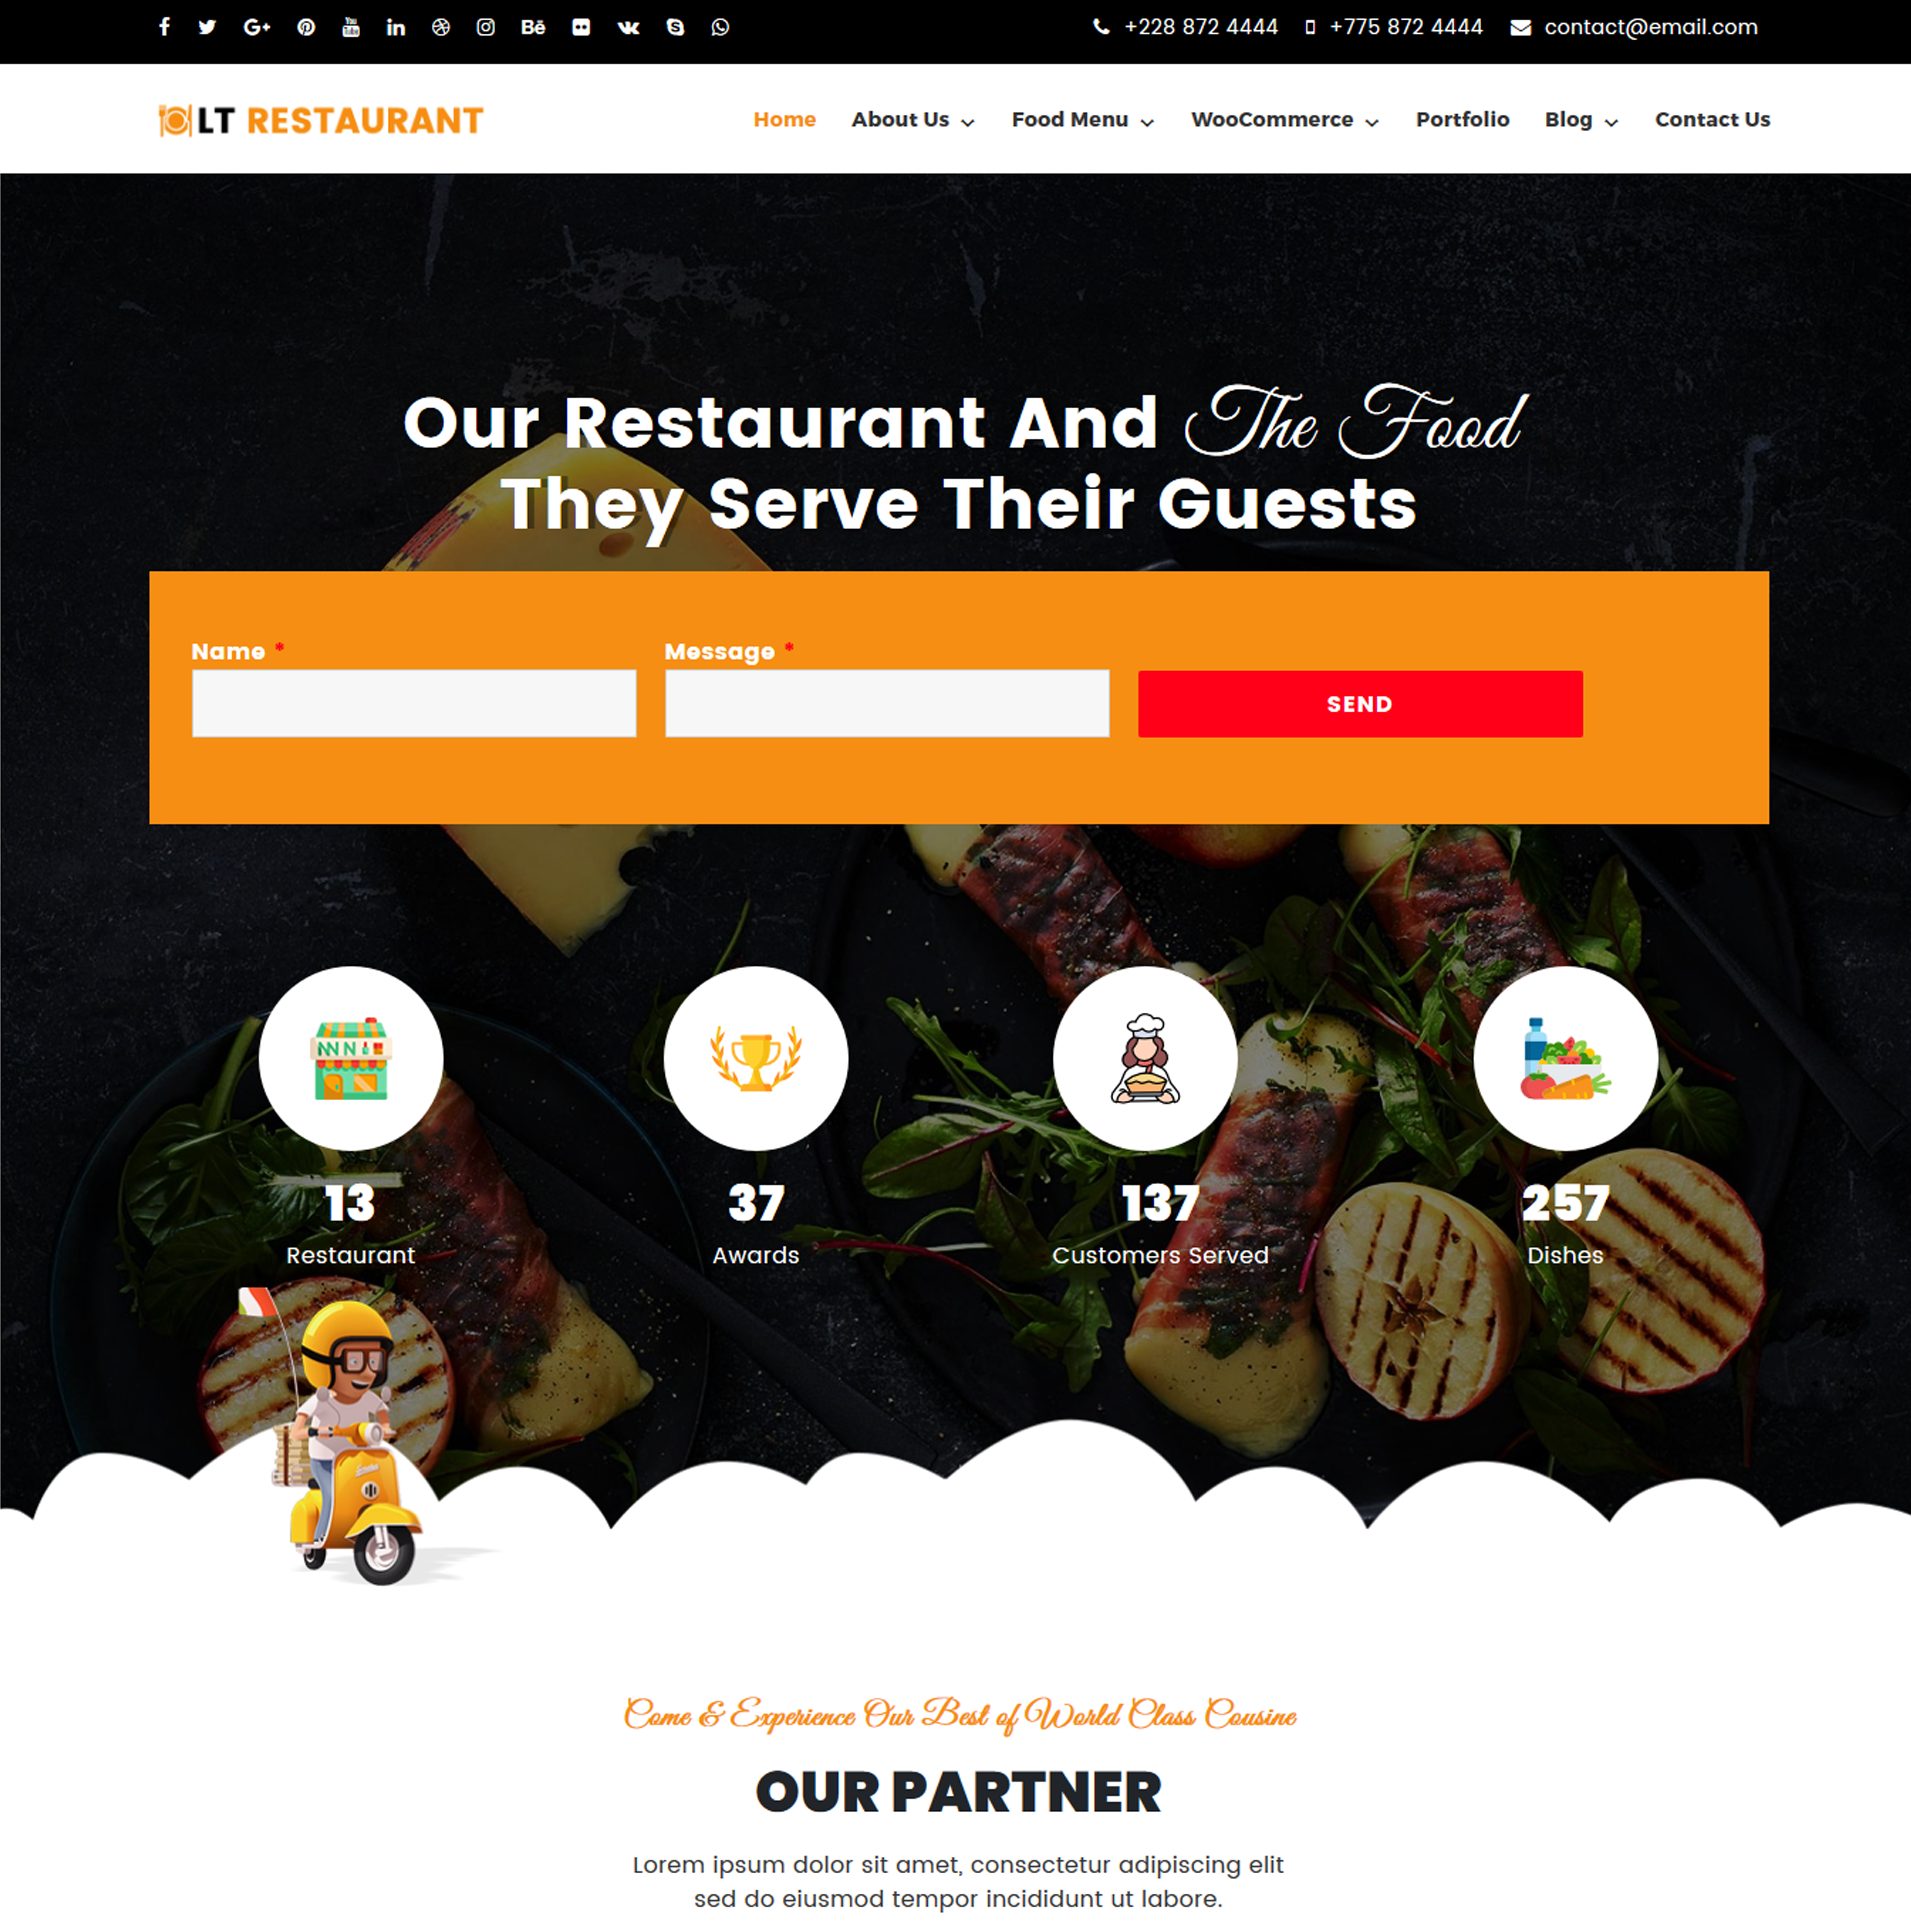 https://ltheme.com/project/lt-restaurant-free-responsive-food-order-restaurant-wordpress-theme/